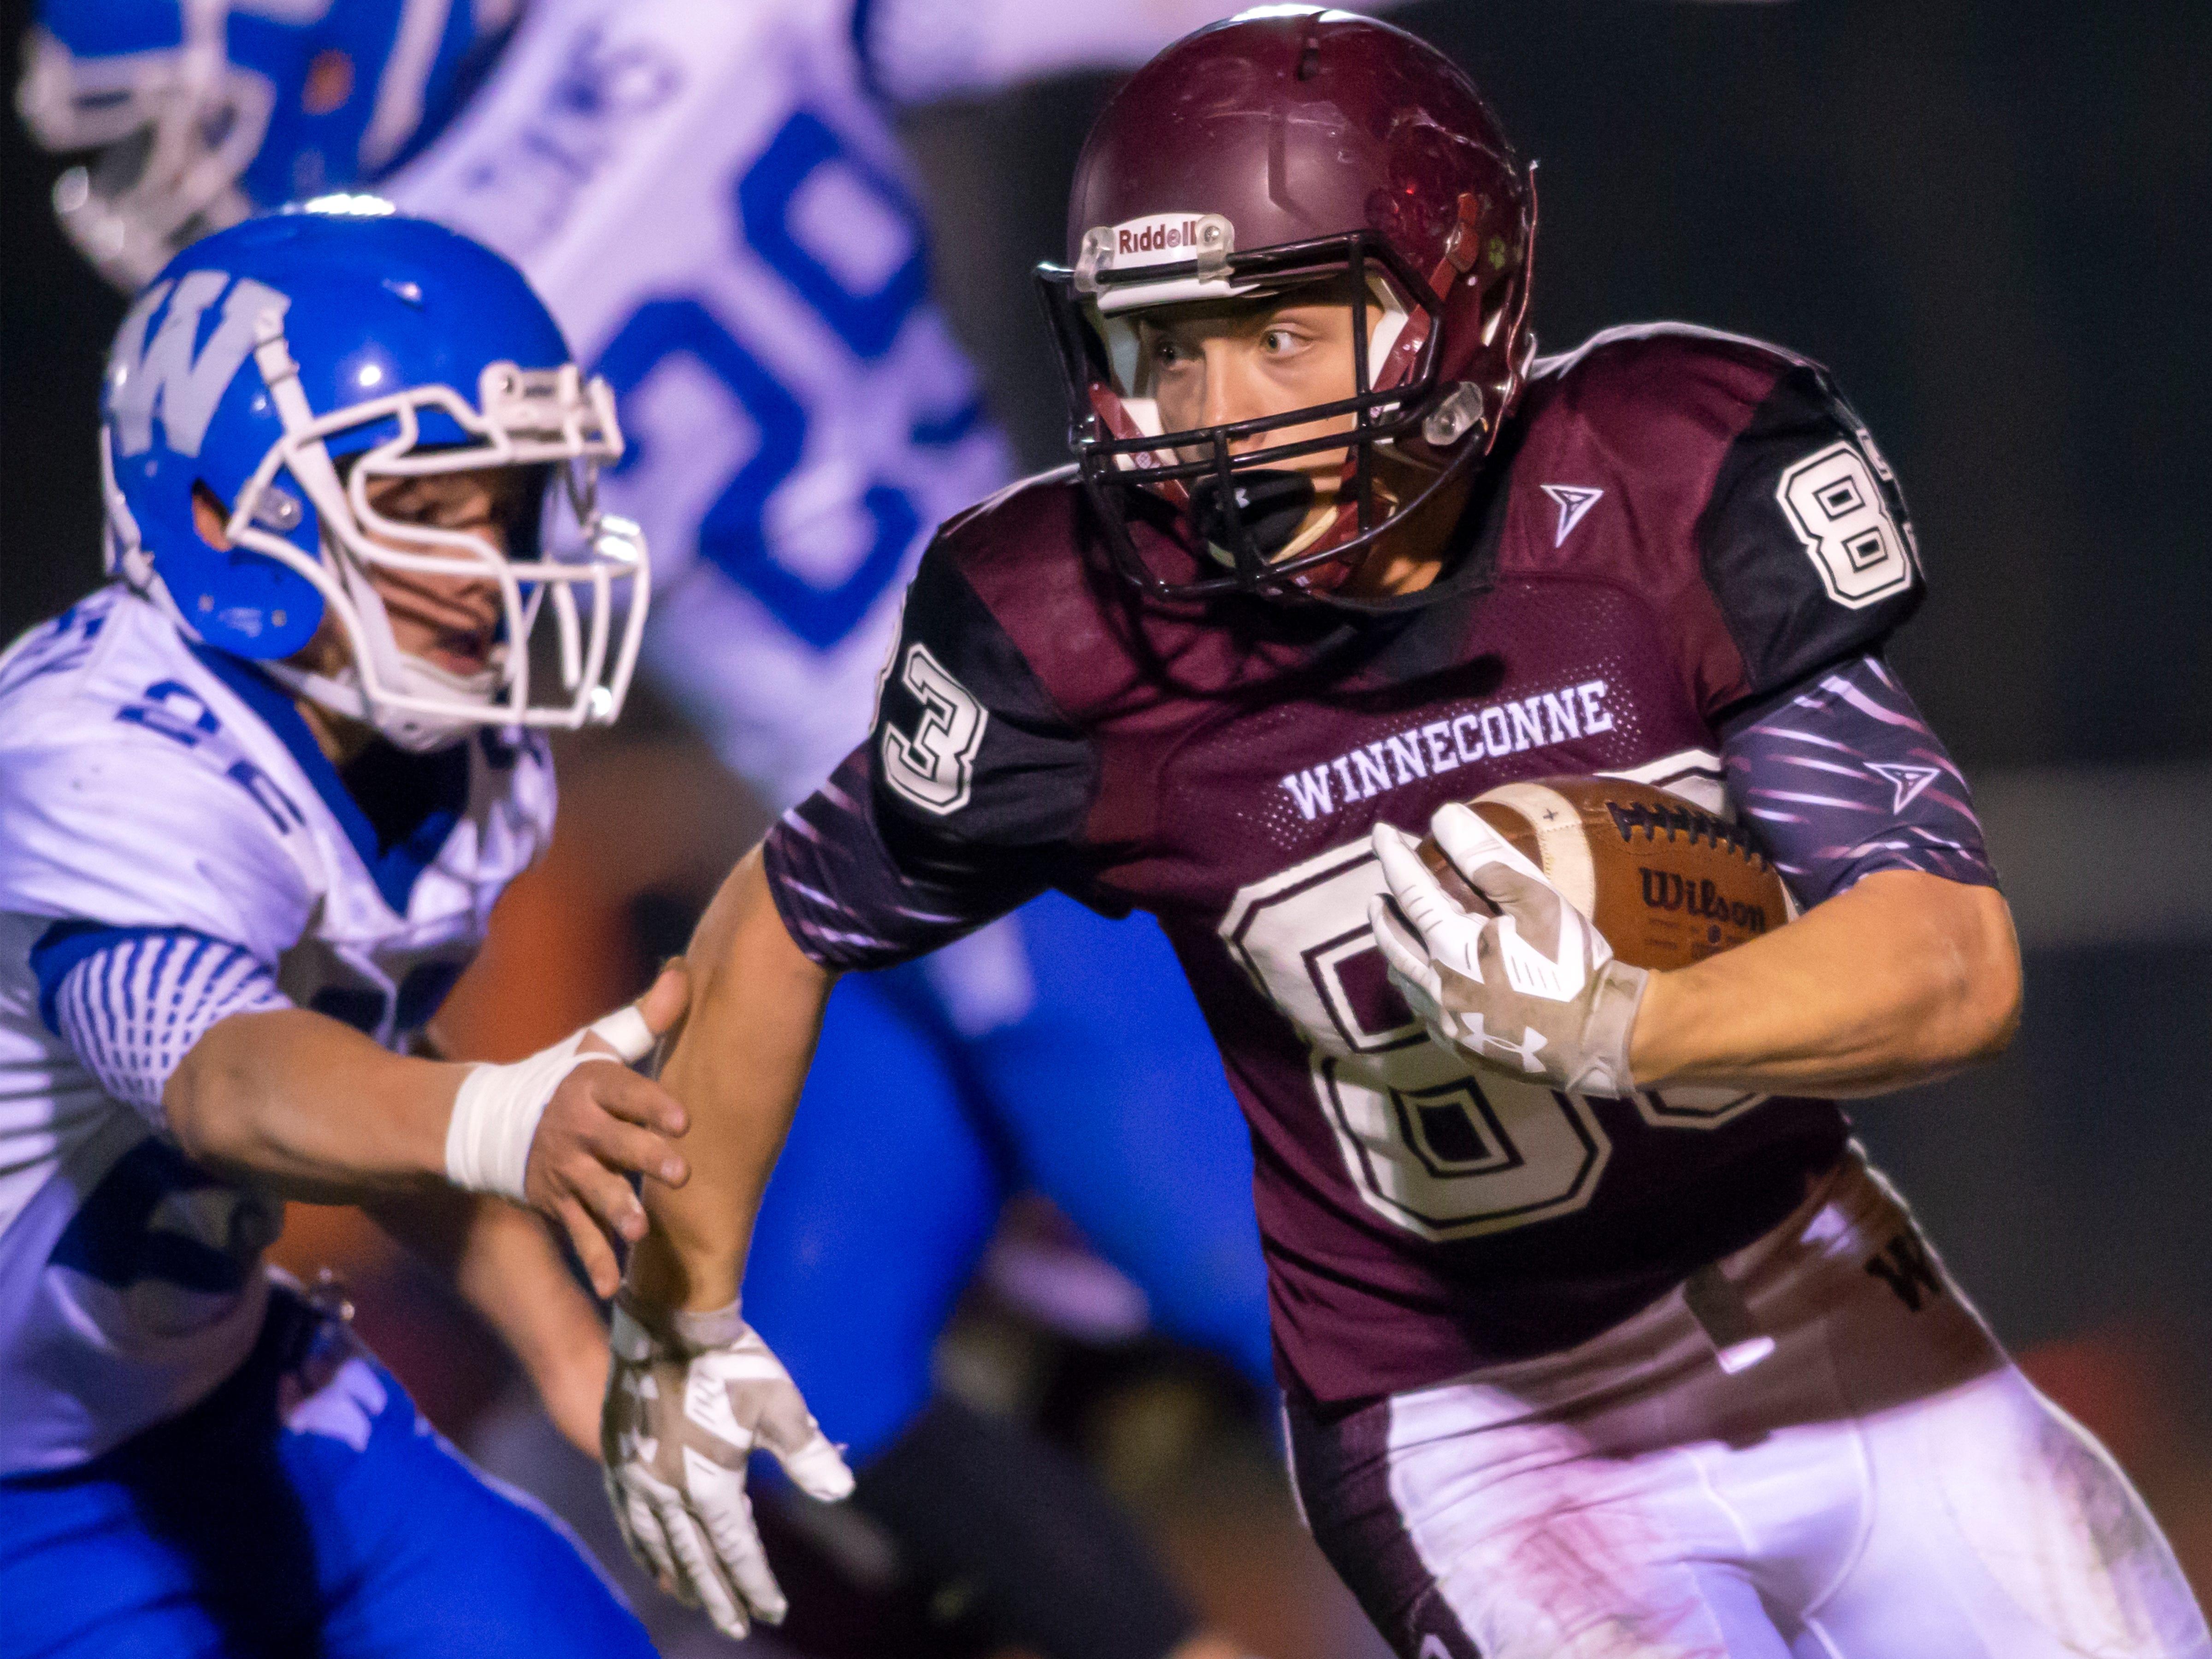 Winneconne's Jacob Omitt runs the ball around Wrightstown traffic at Winneconne High School on Friday, October 26, 2018.